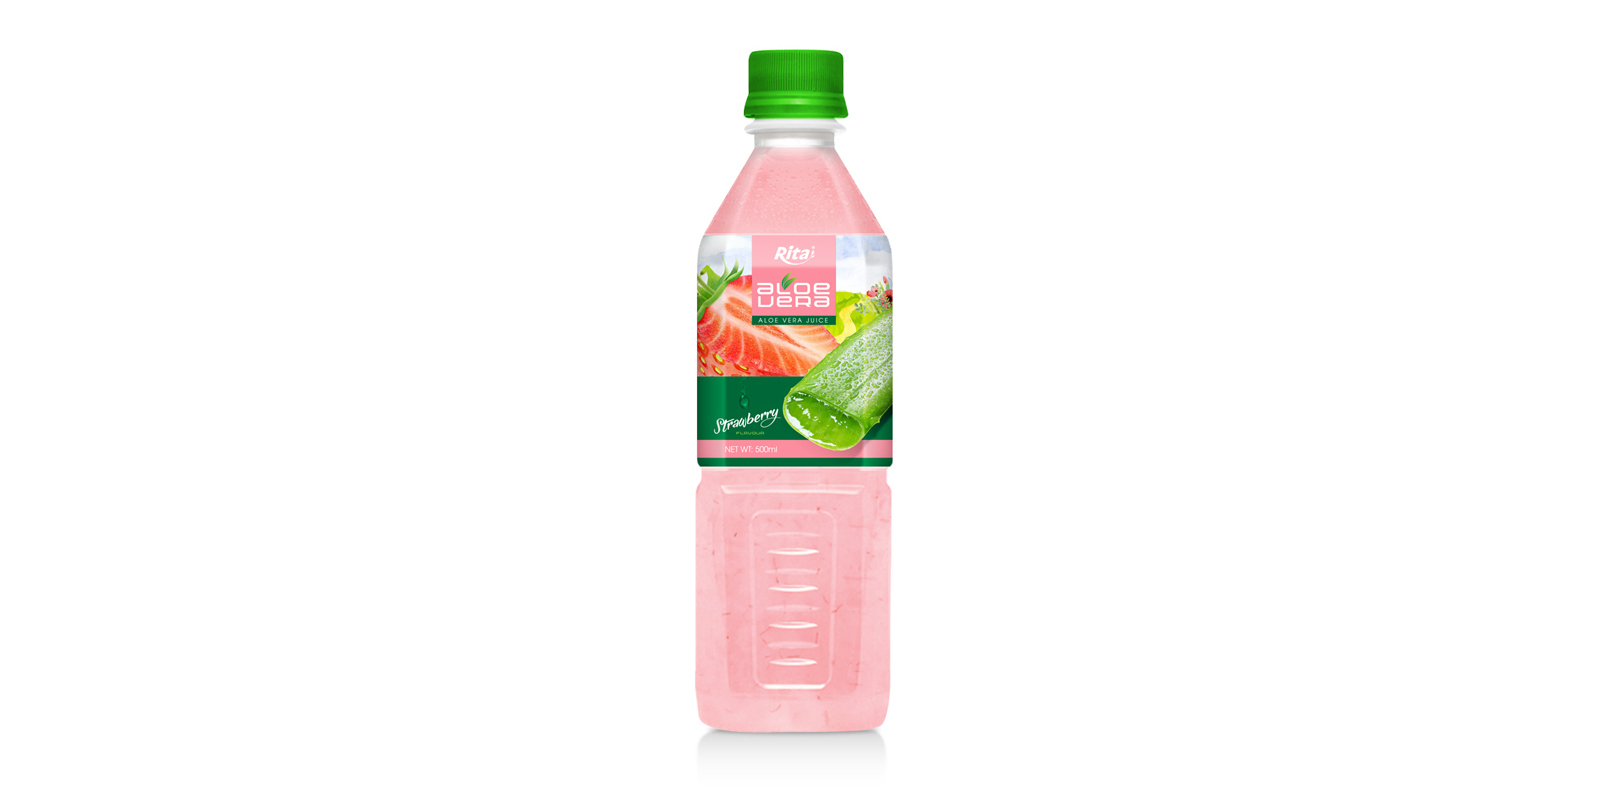 Aloe vera strawberry juice 500ml Pet Bottle